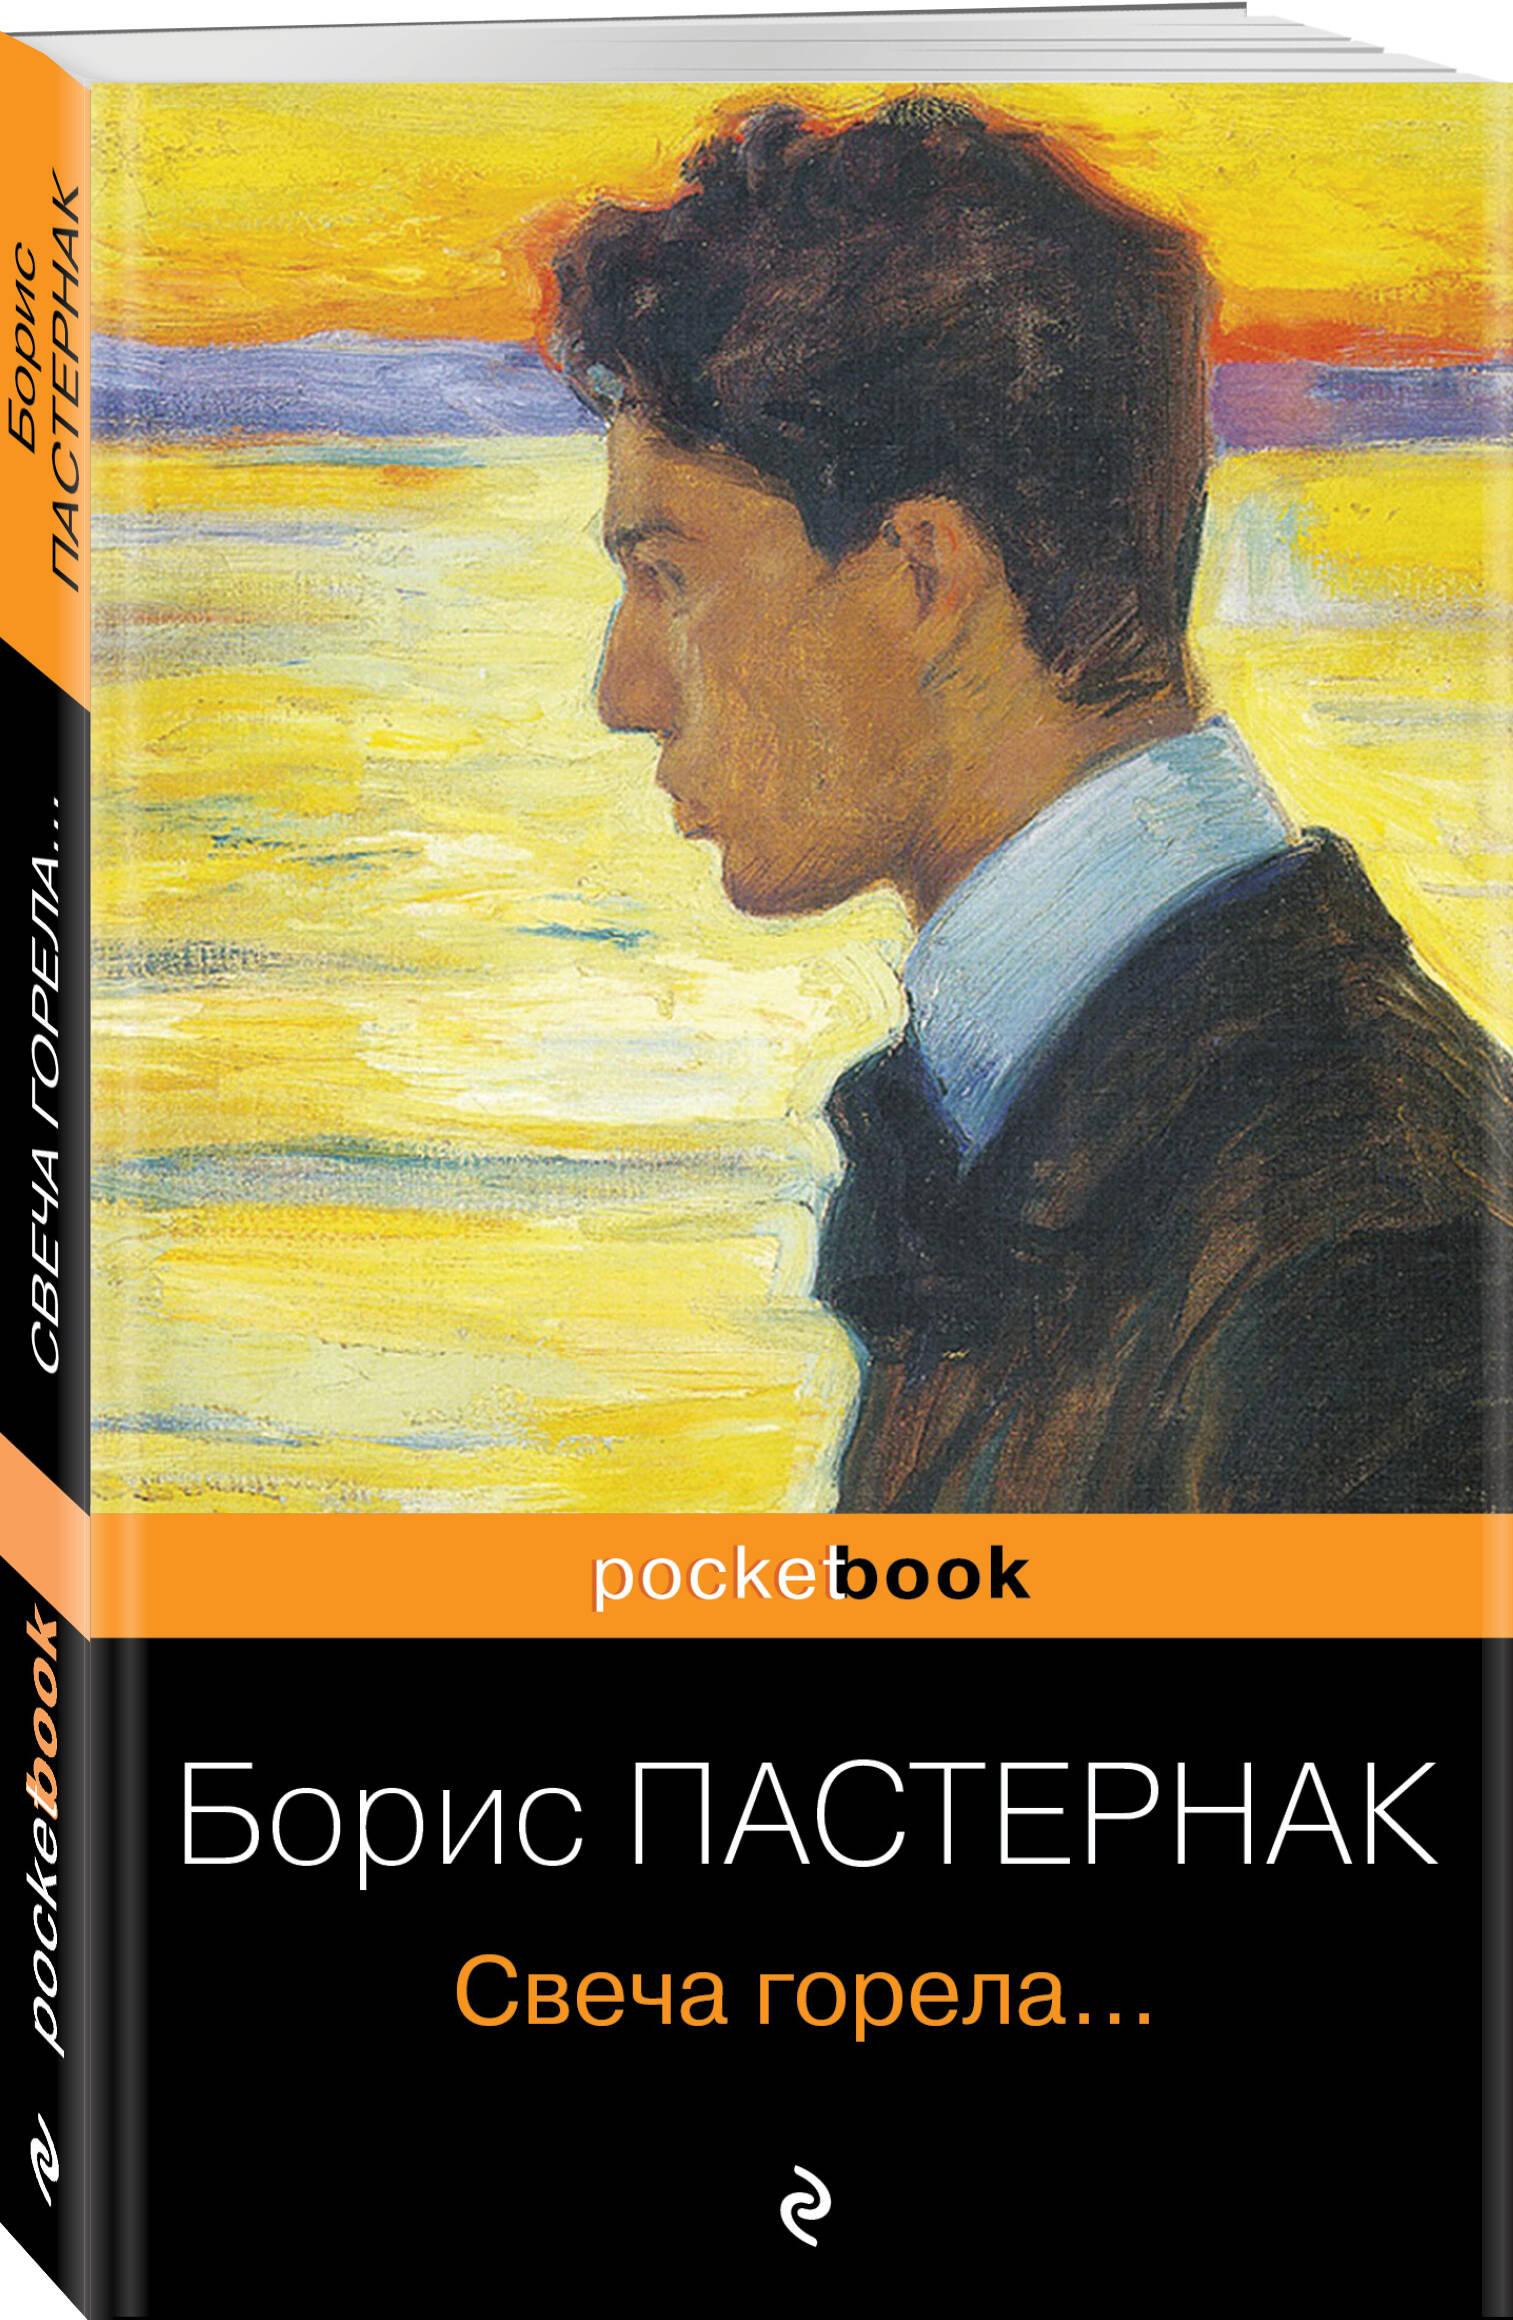 Пастернак Борис Леонидович Свеча горела...